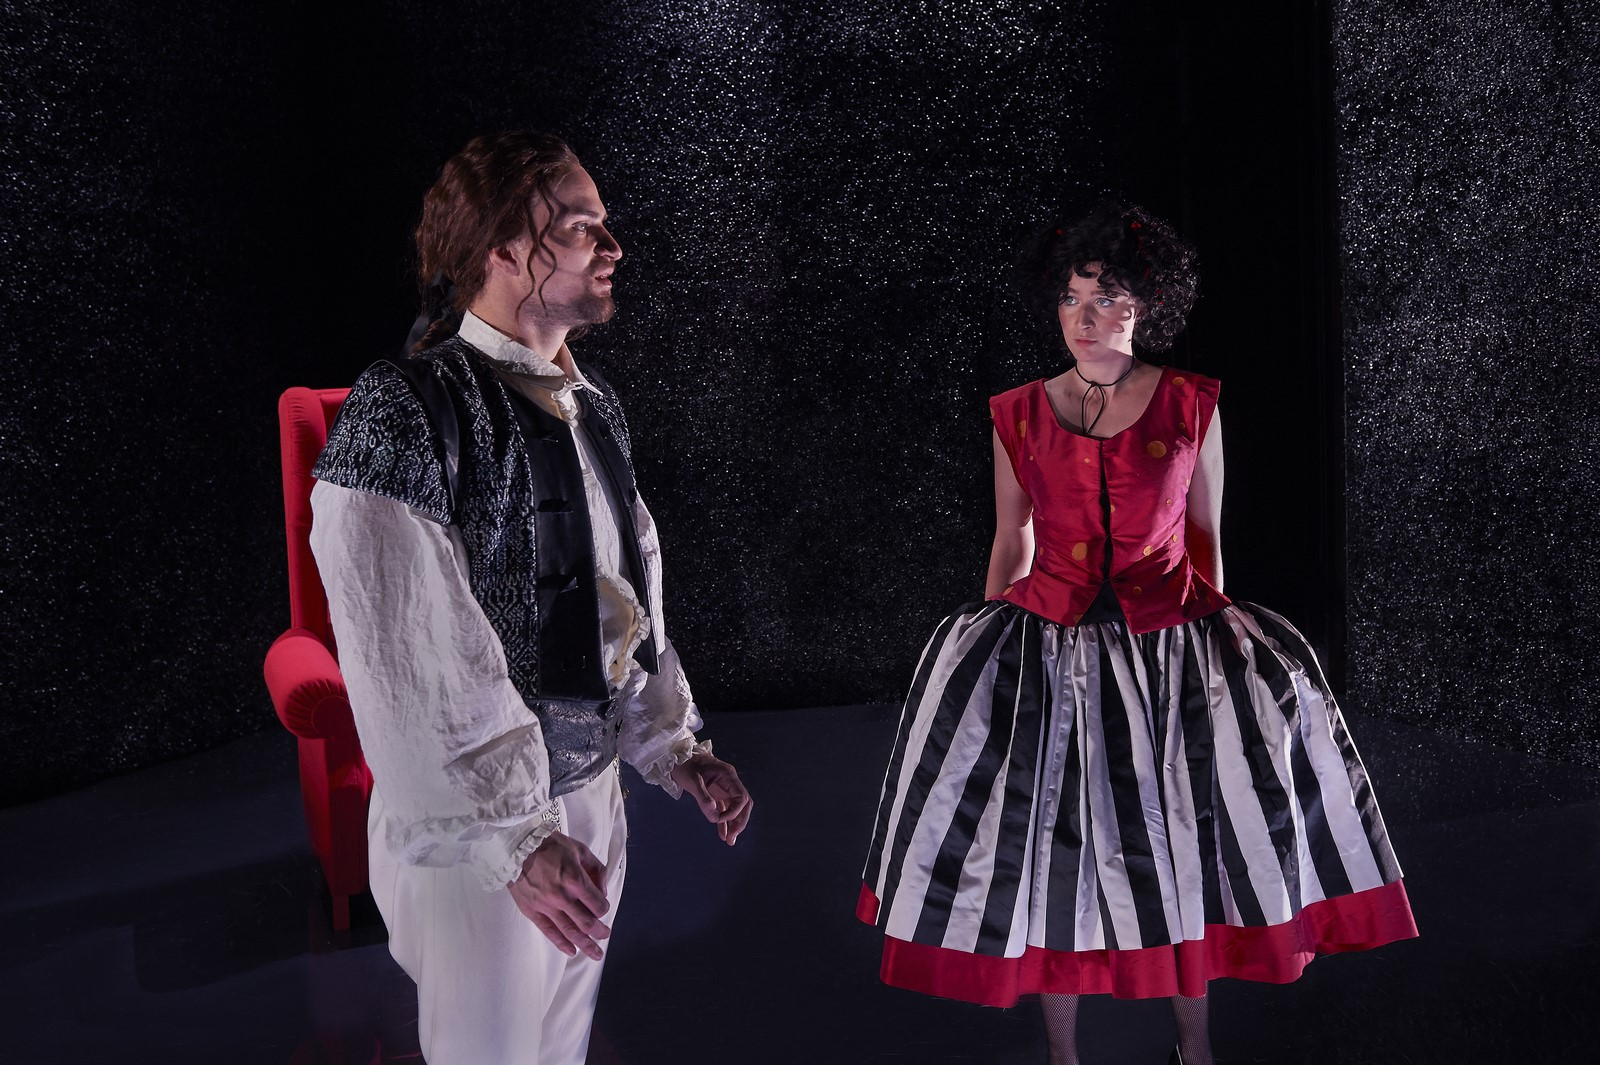 Anmeldelse: Figaros bryllup, Aalborg Teater